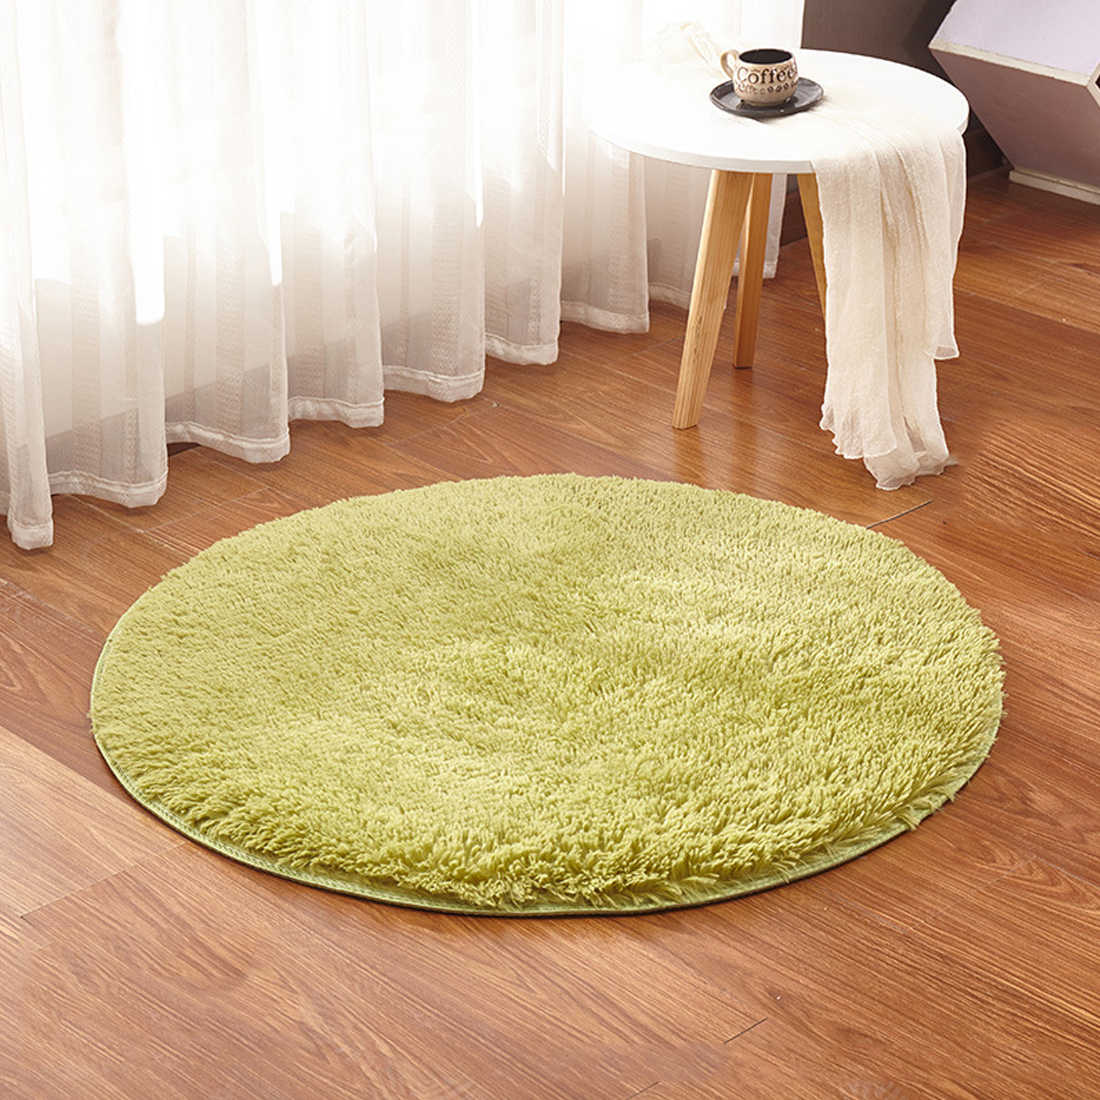 Soft Shaggy Area Round Rug Living Room Carpet Bedroom Floor